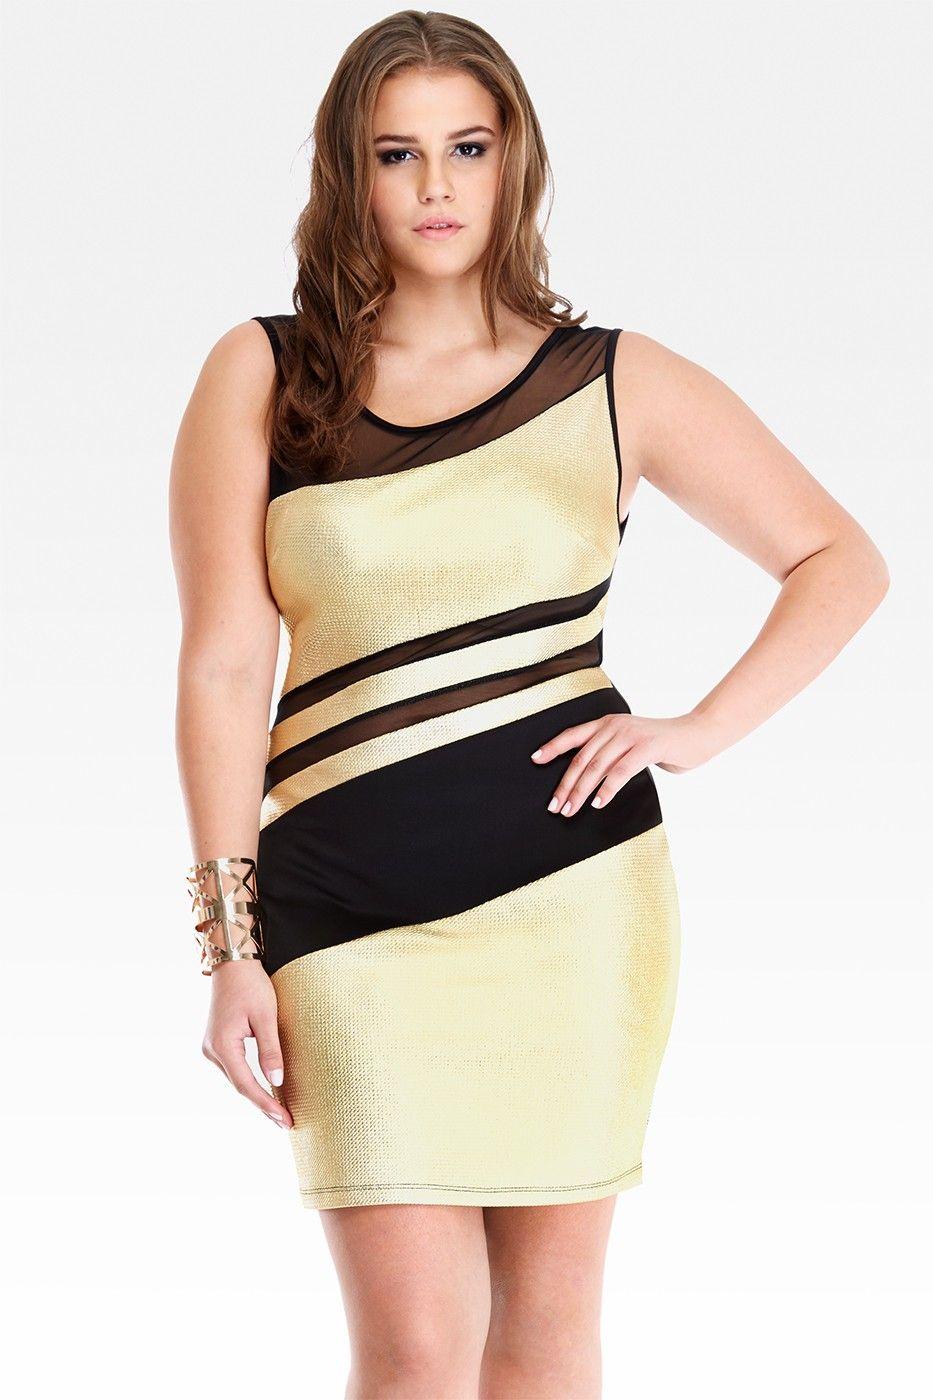 Metallic Colorblock Dress Moda Plus Size Pinterest Colorblock